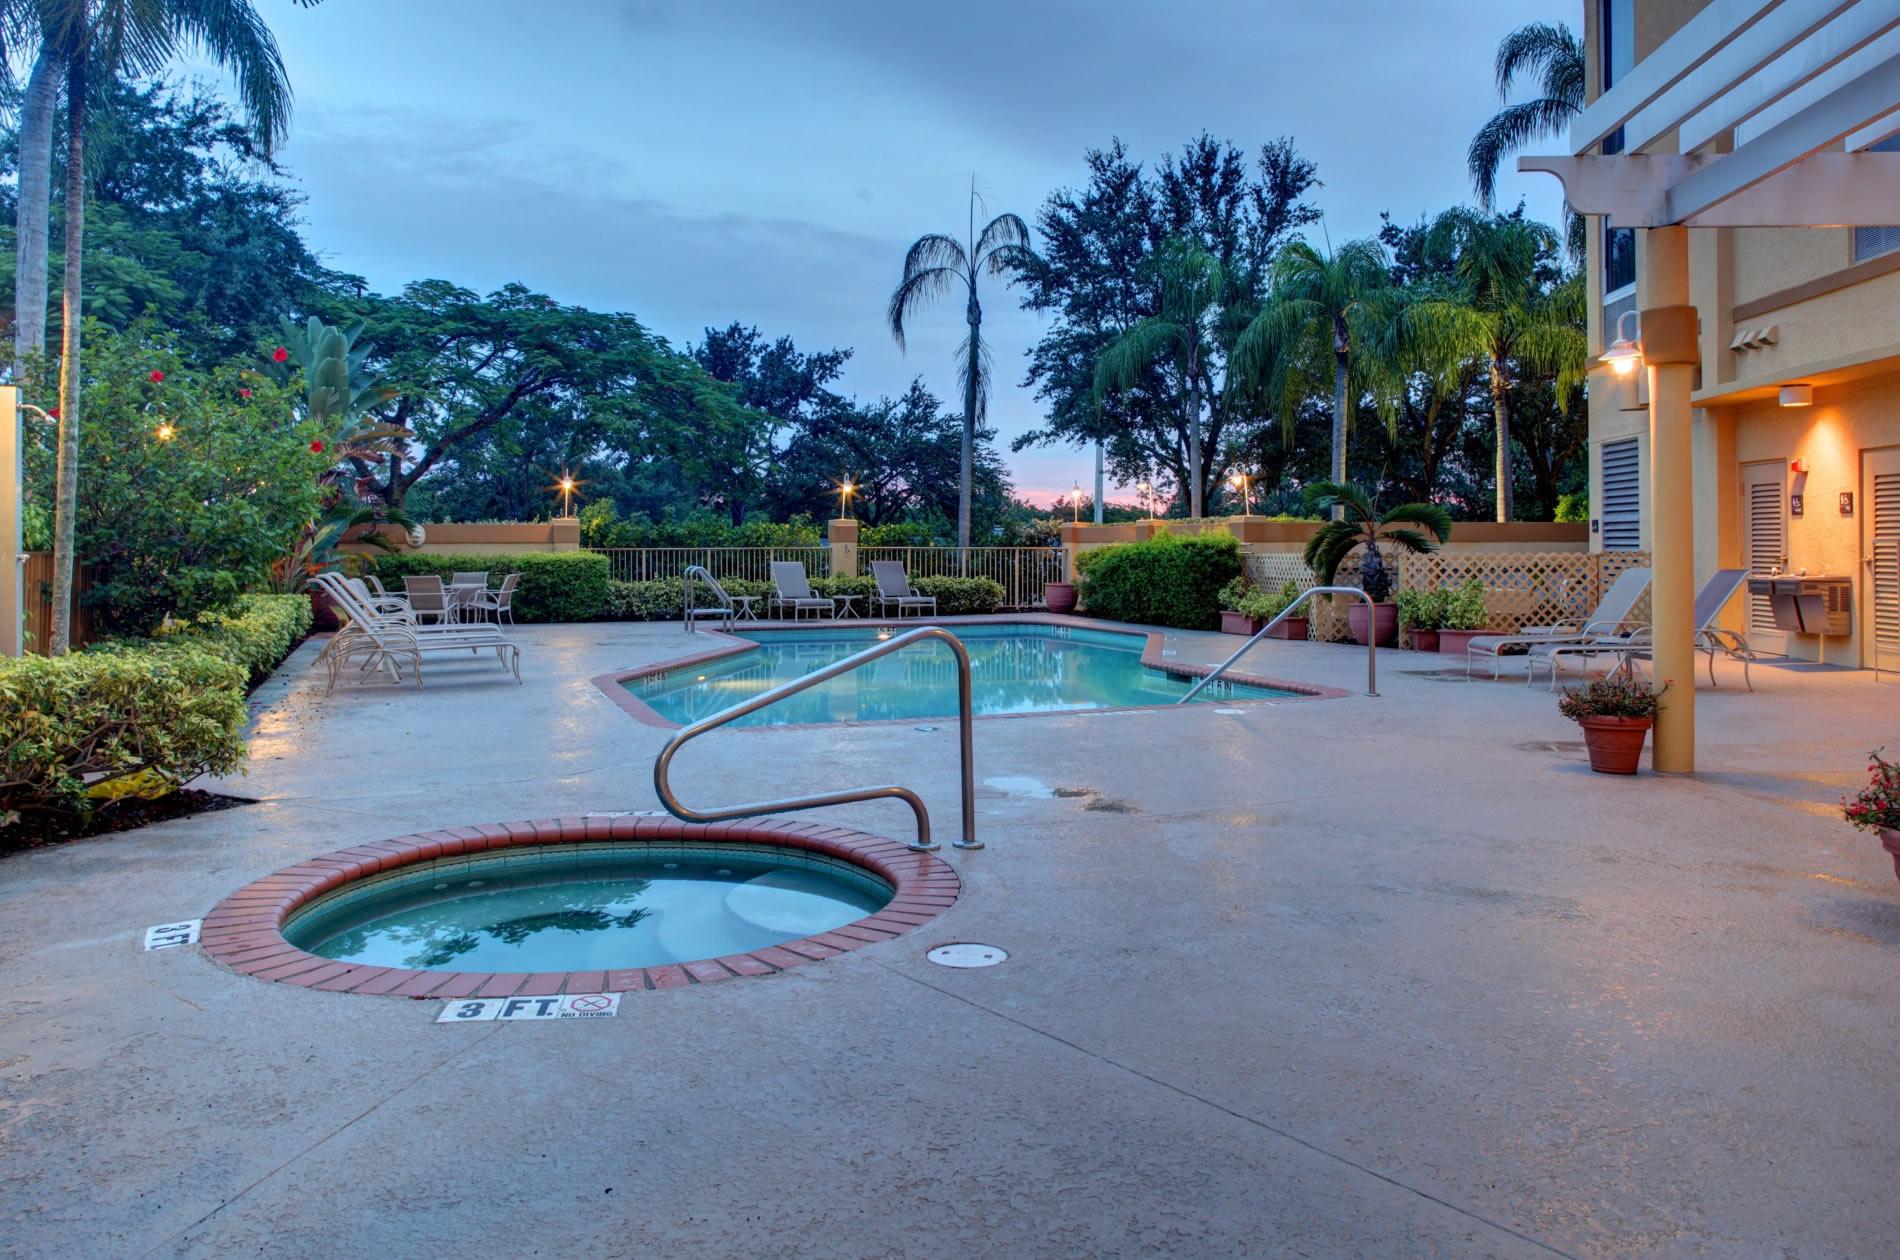 Hampton Inn by Hilton Pembroke Pines - Fort Lauderdale West image 9